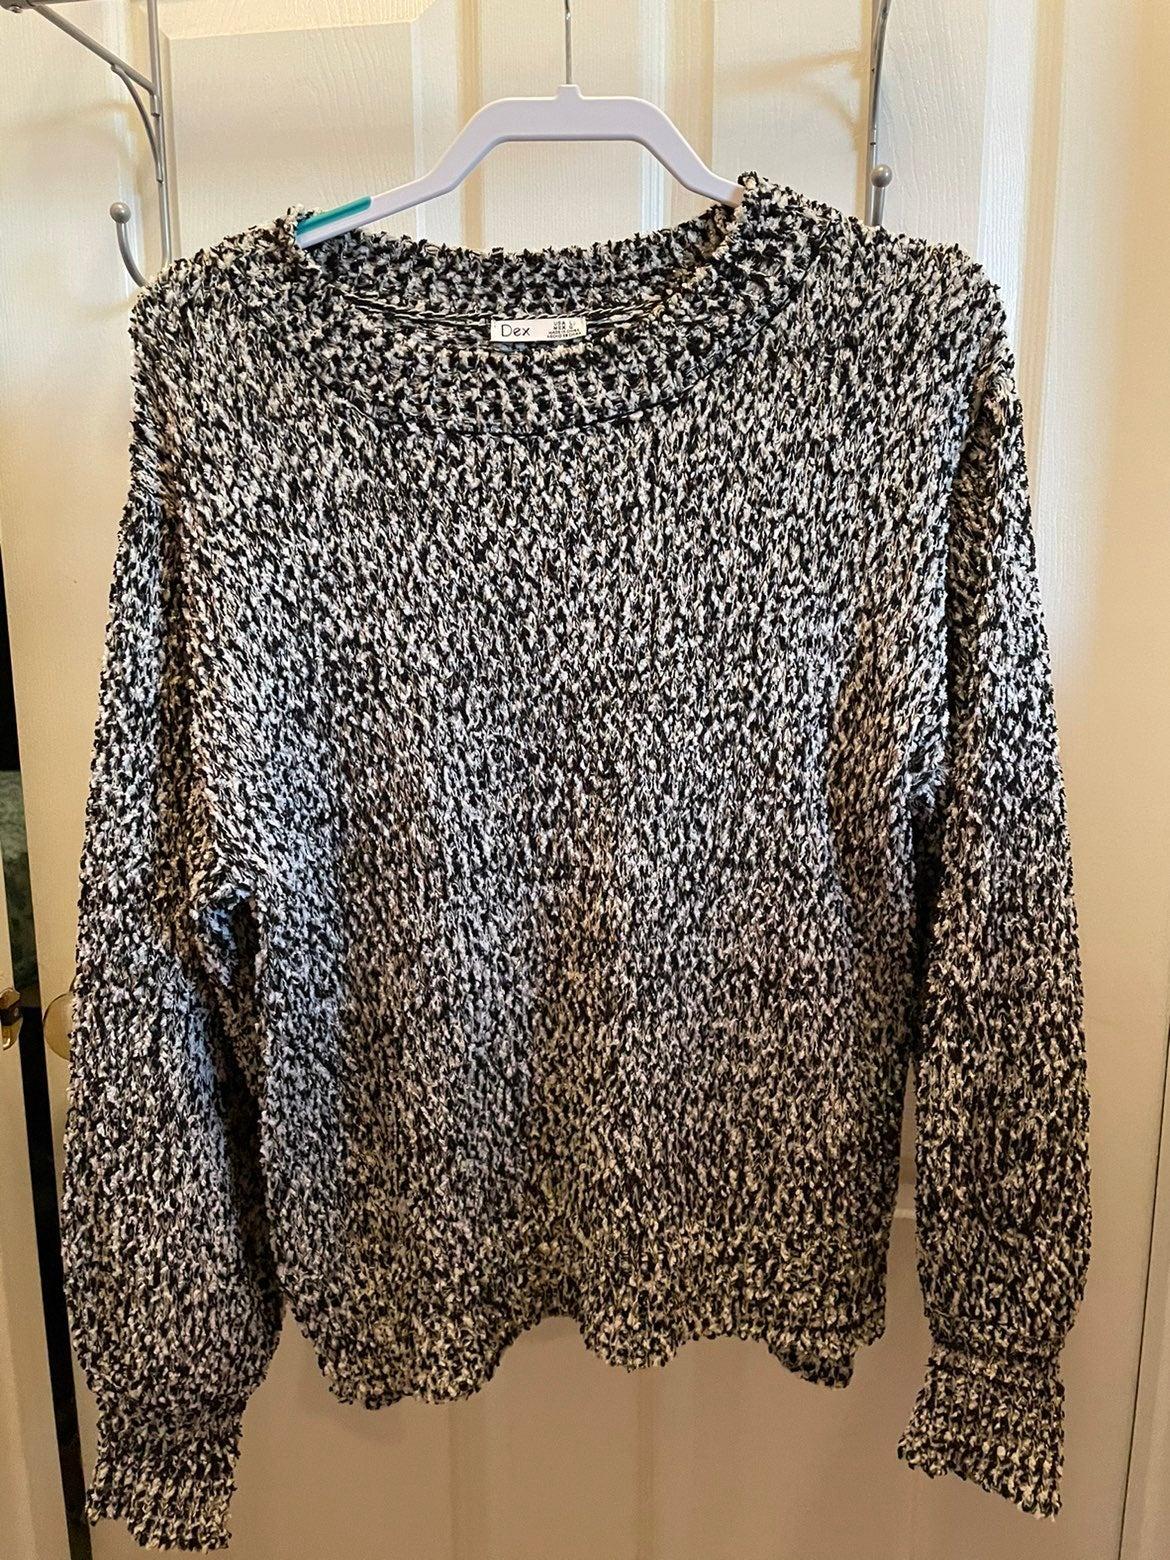 Dex brand Large Sweater - Like New